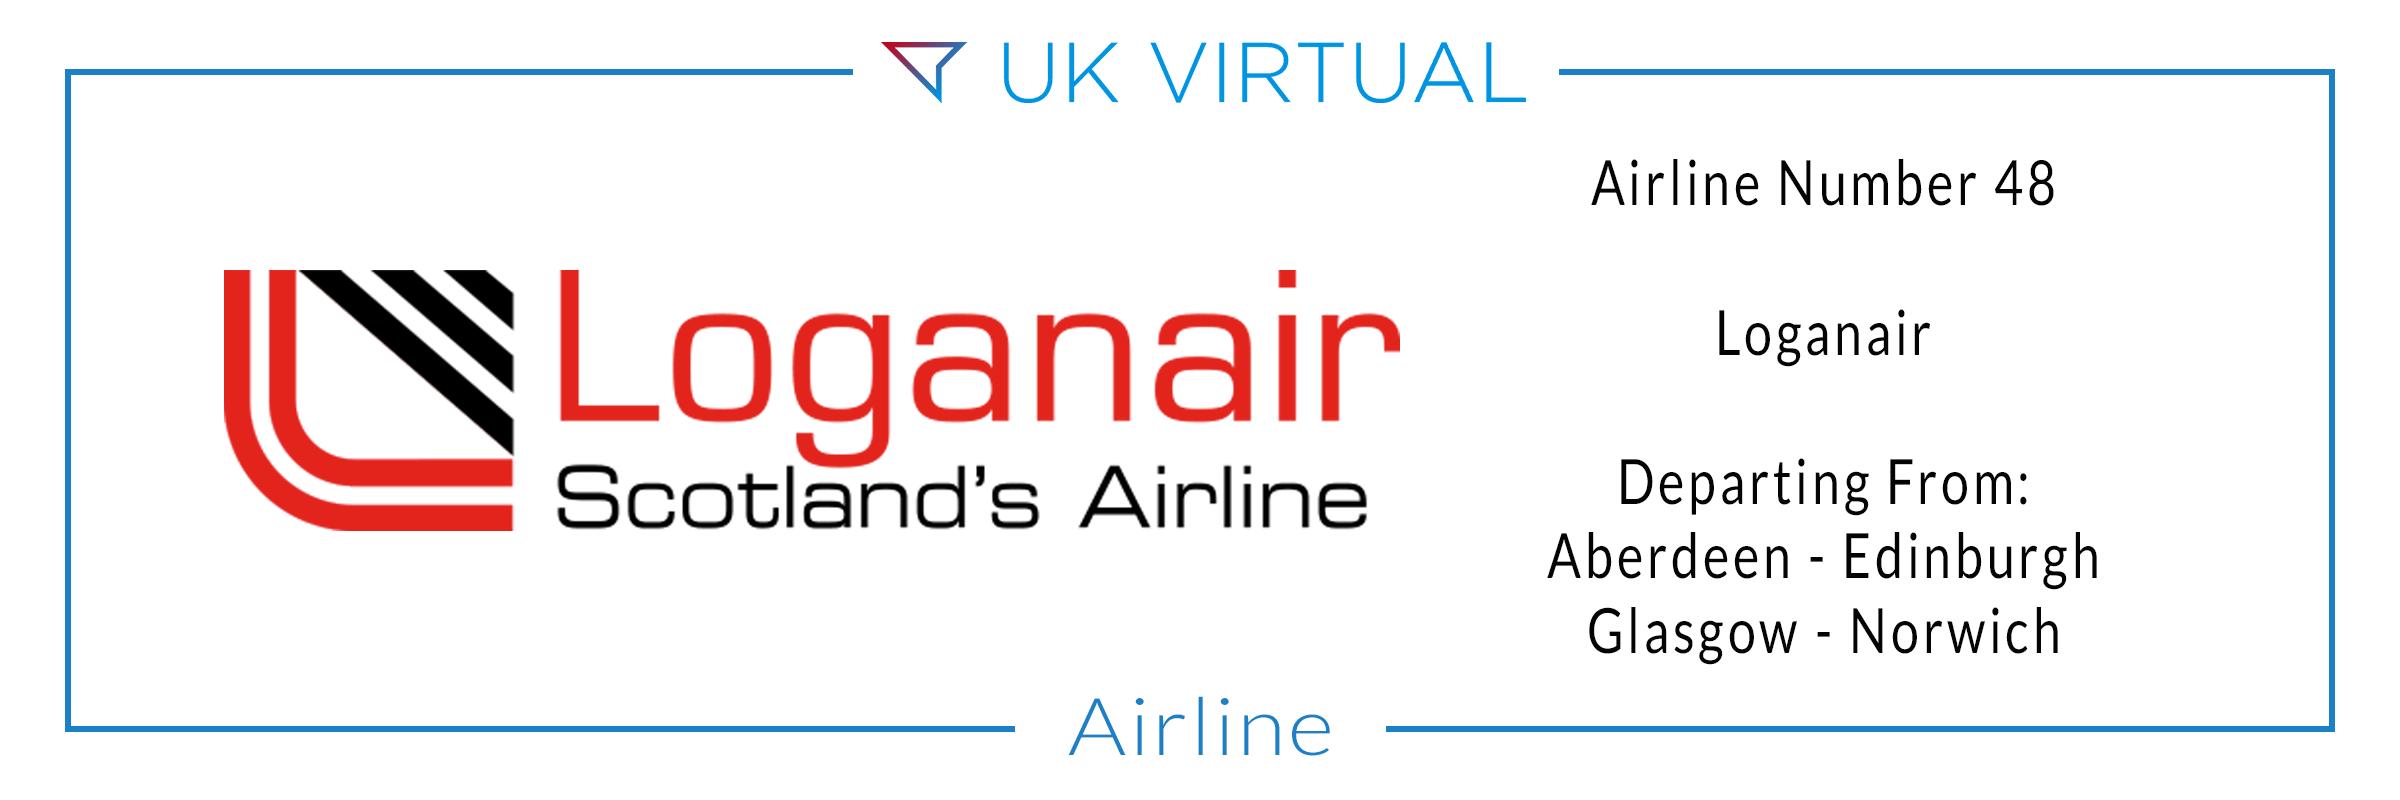 Airline Number 48: Loganair